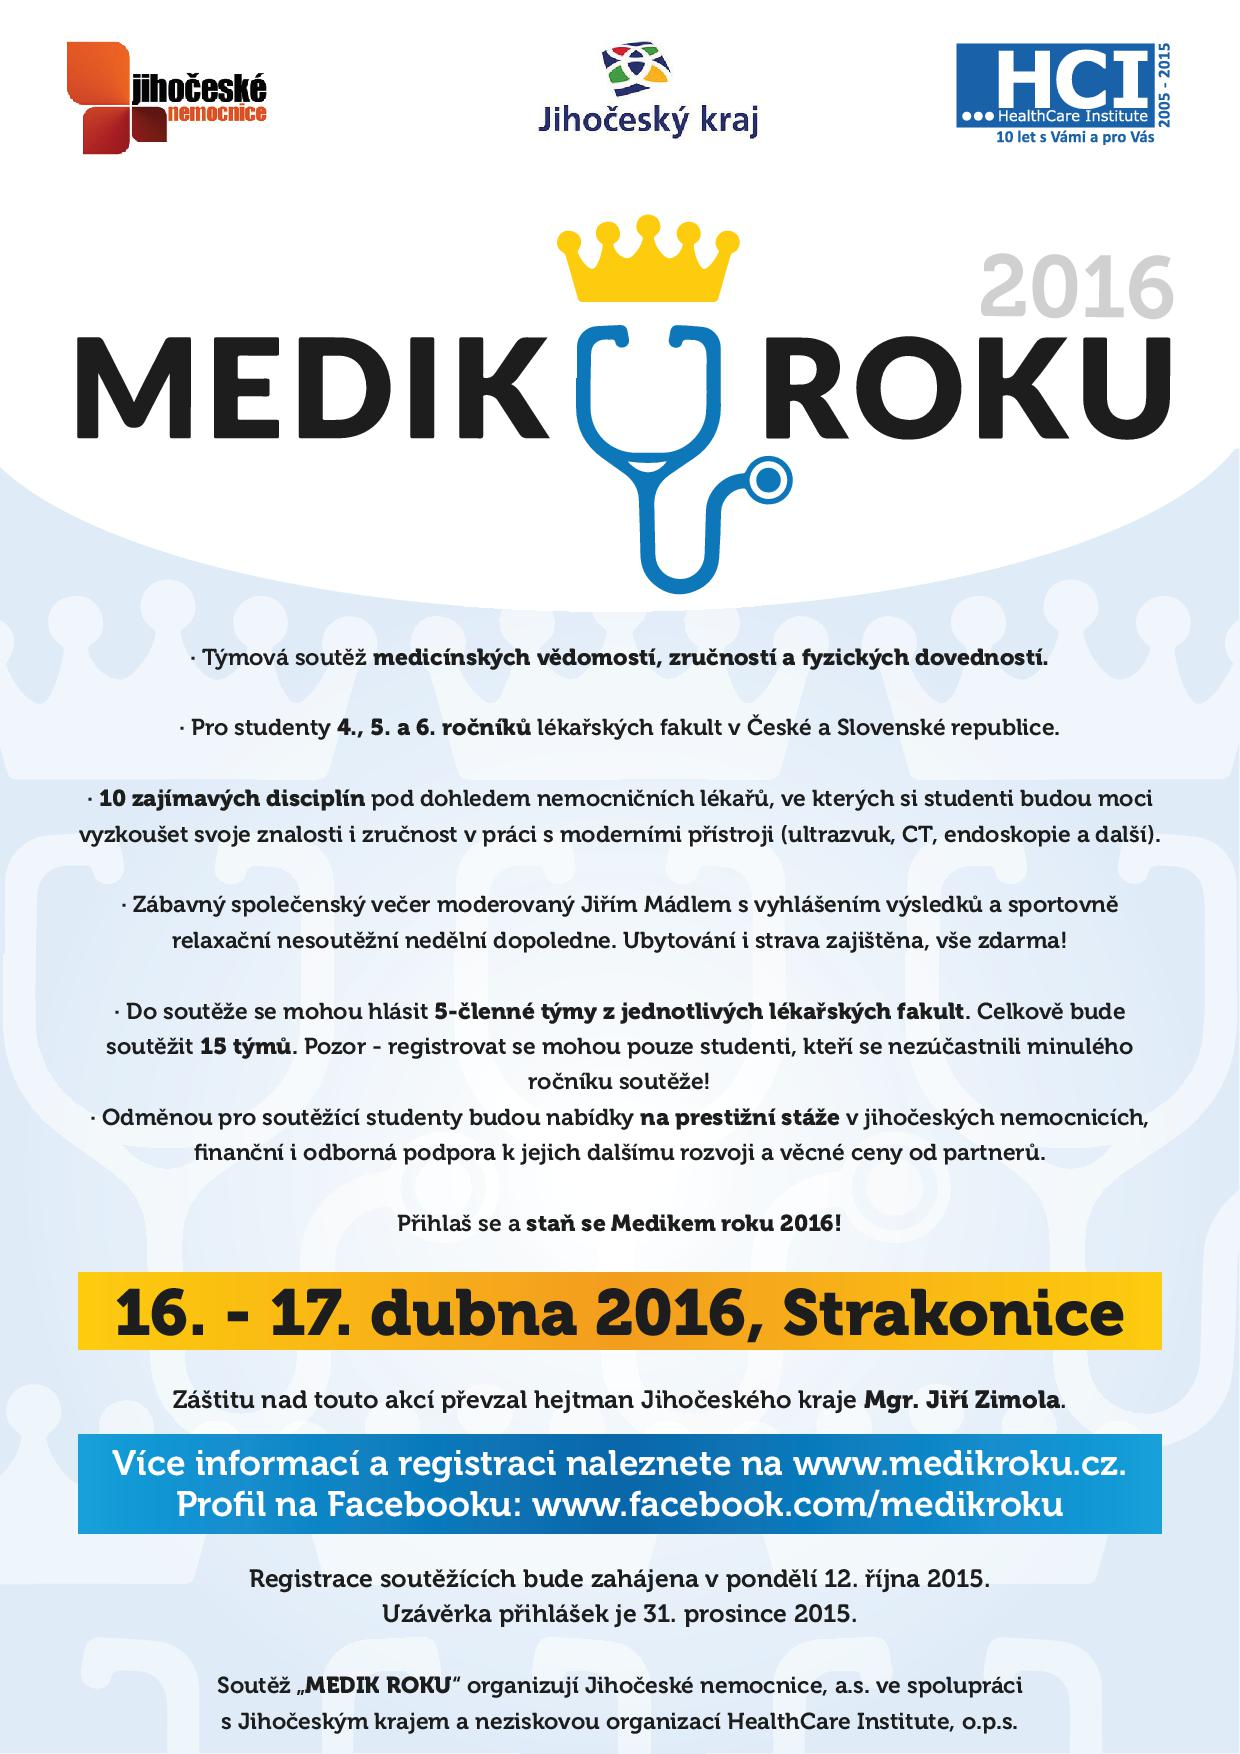 plakat medik roku